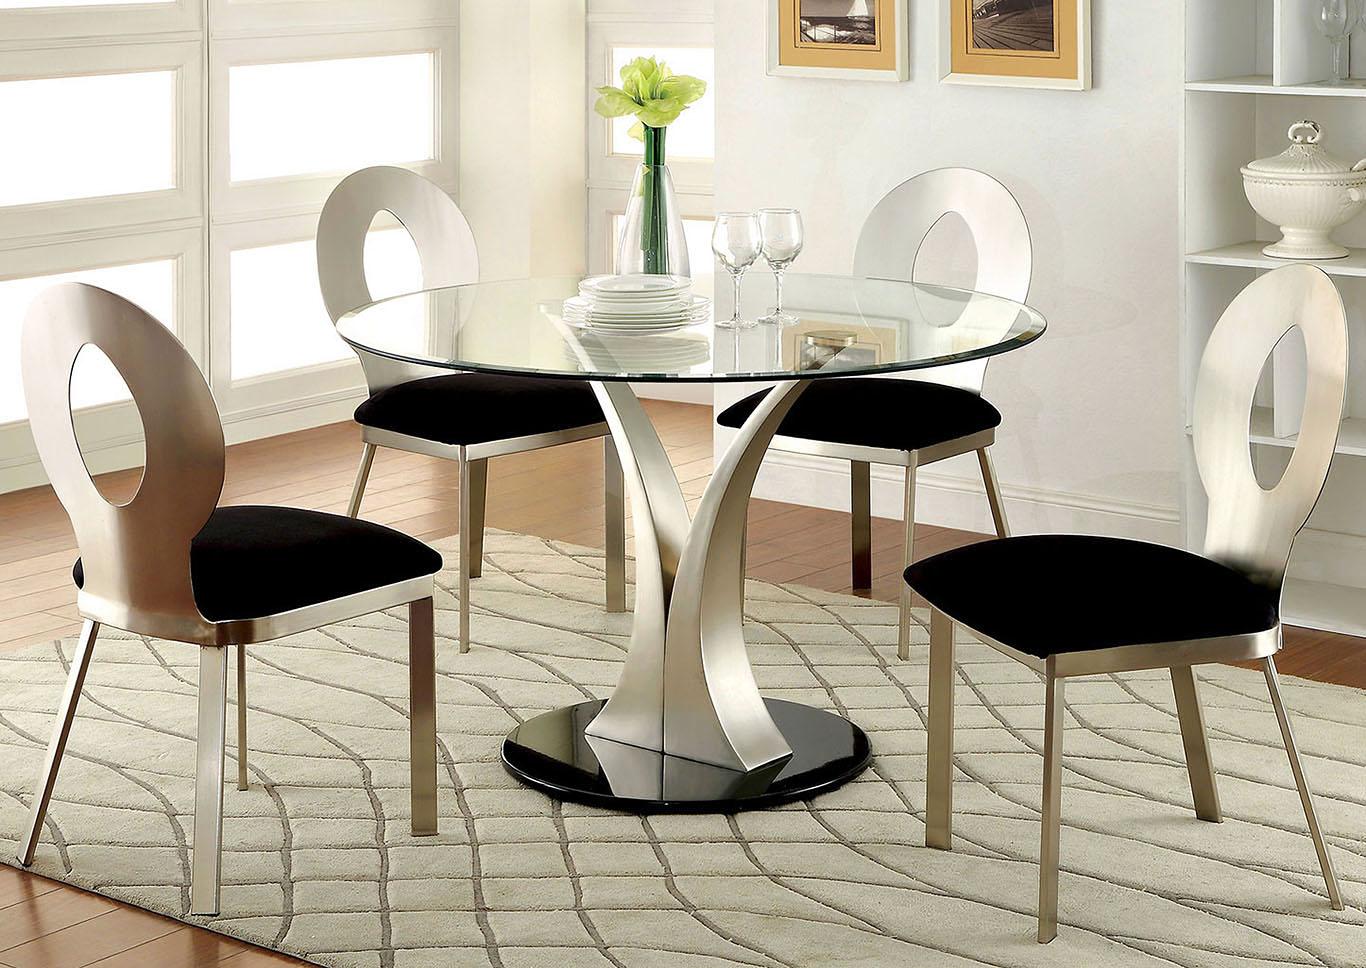 Valo Silver Black Dining Table W 4 Side Chair Renaissance Philadelphia Pa